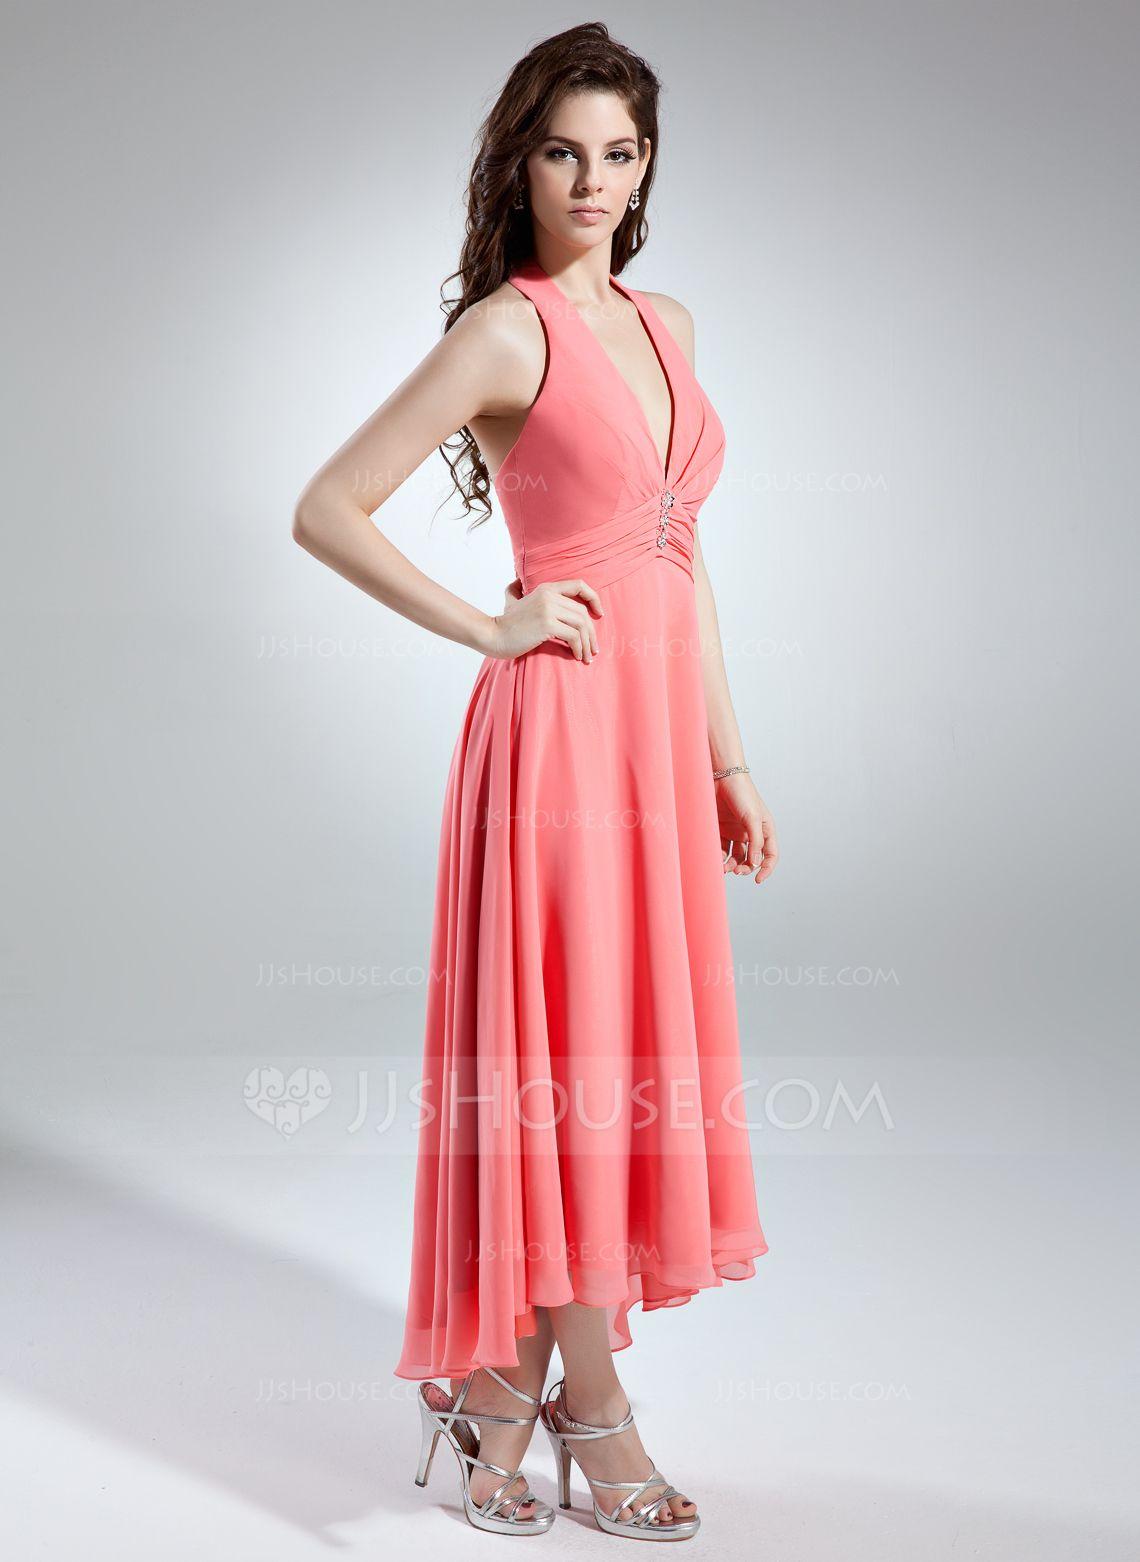 Lujoso Asymmetrical Bridesmaid Dress Galería - Colección de Vestidos ...